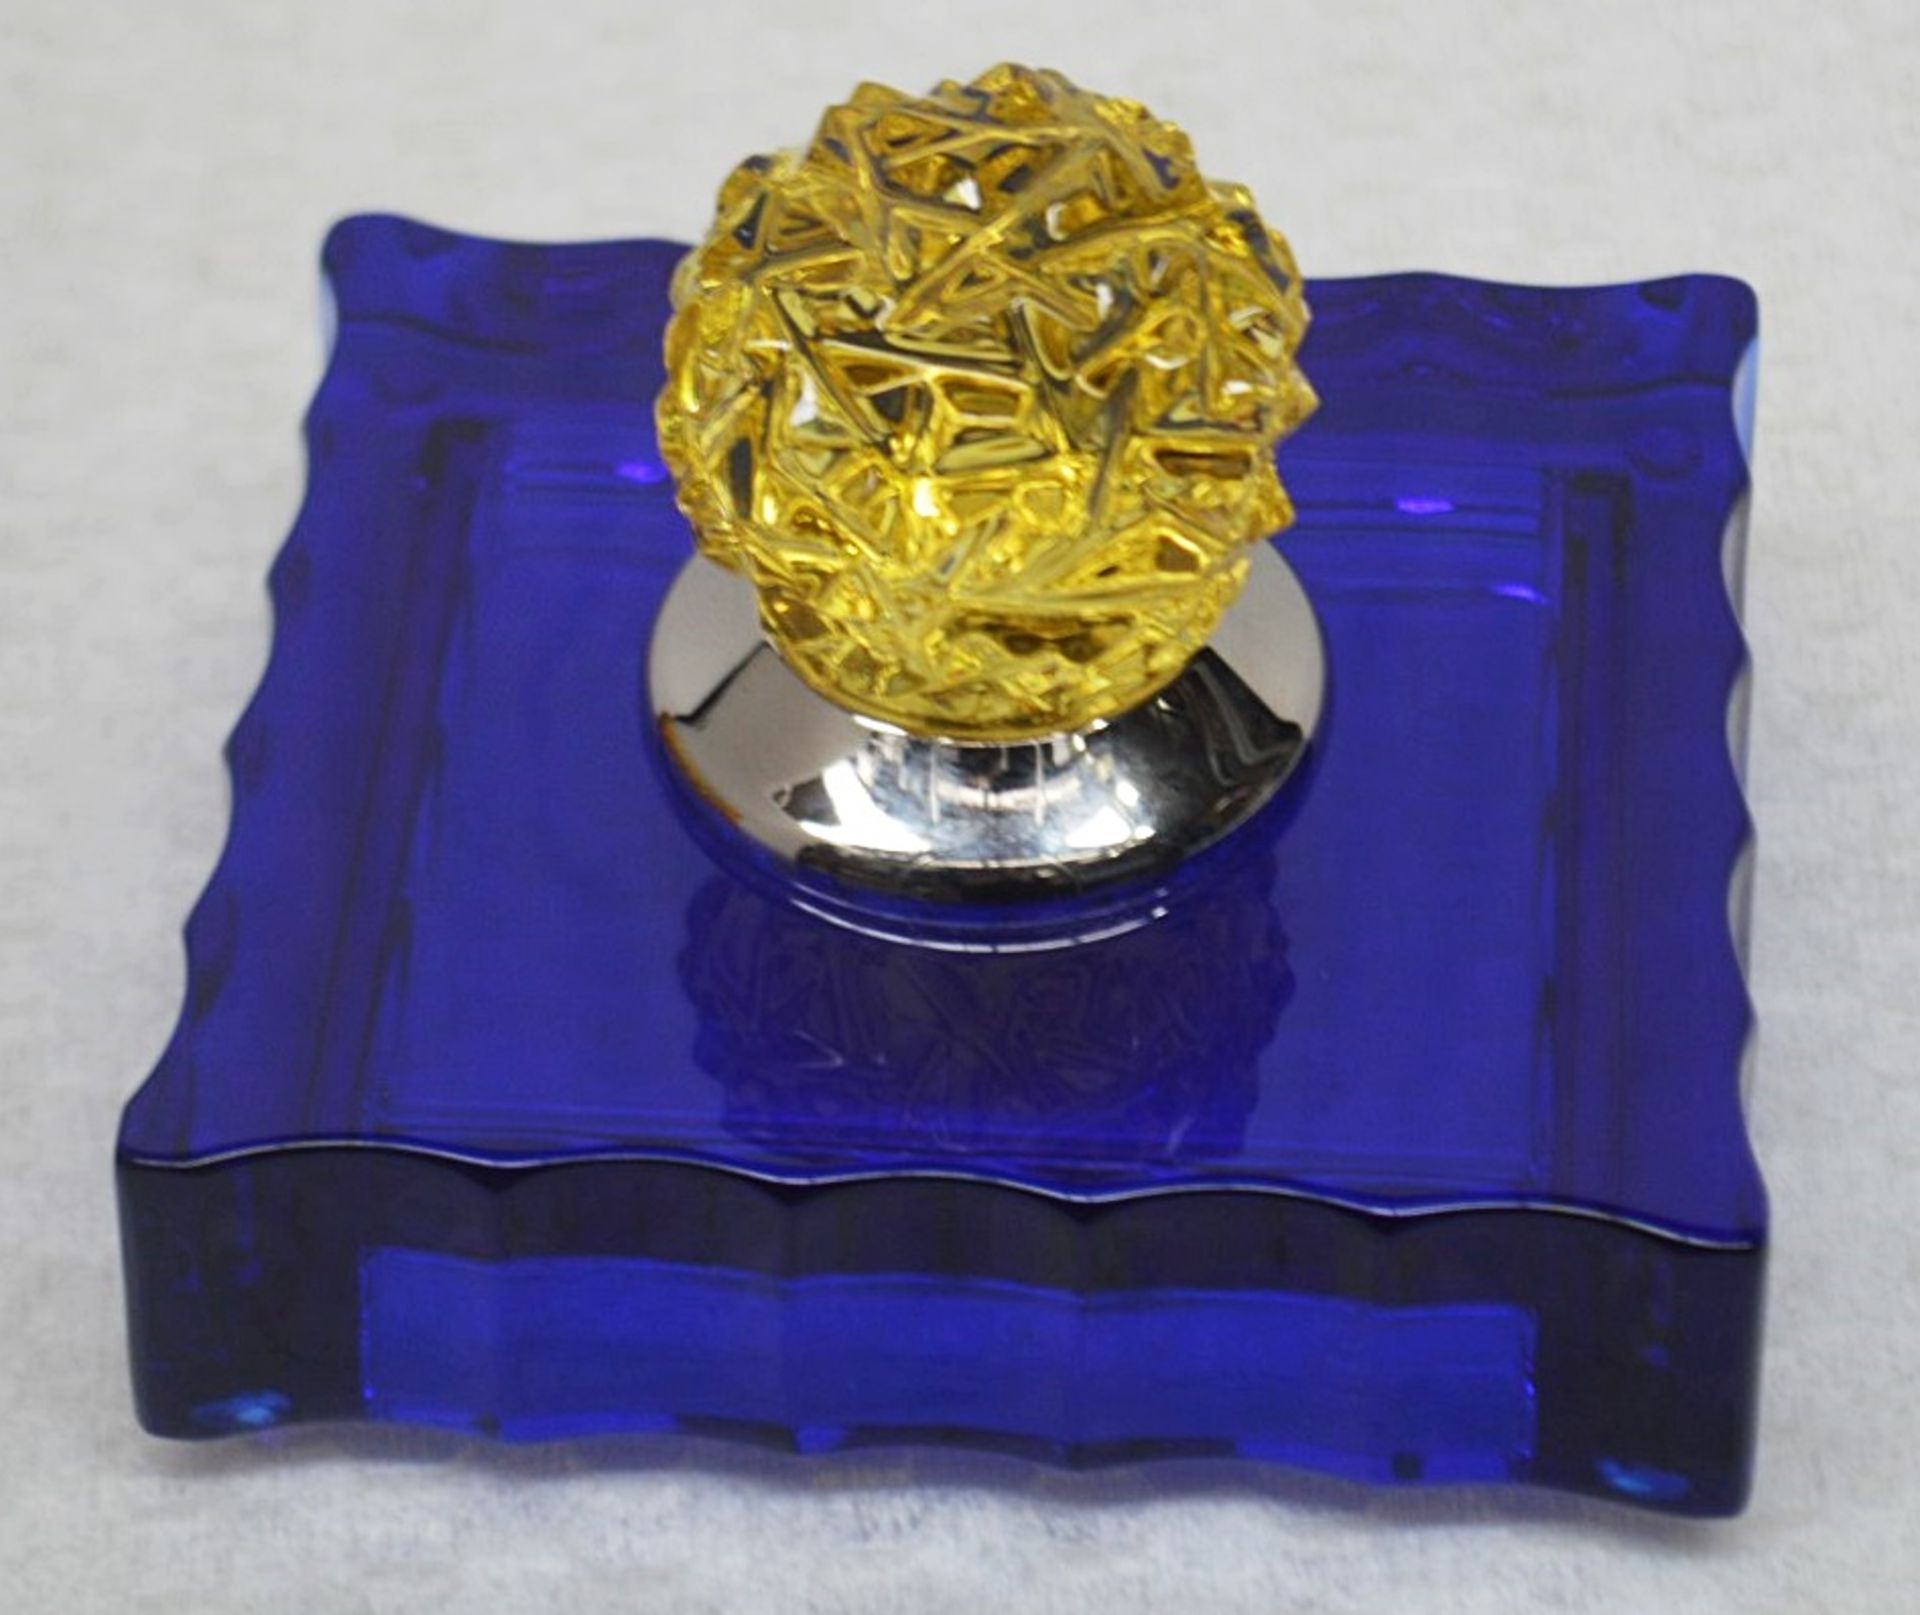 1 x BALDI 'Home Jewels' Italian Hand-crafted Artisan Crystal Box In Dark Blue / Yellow - RRP £1,015 - Image 3 of 4